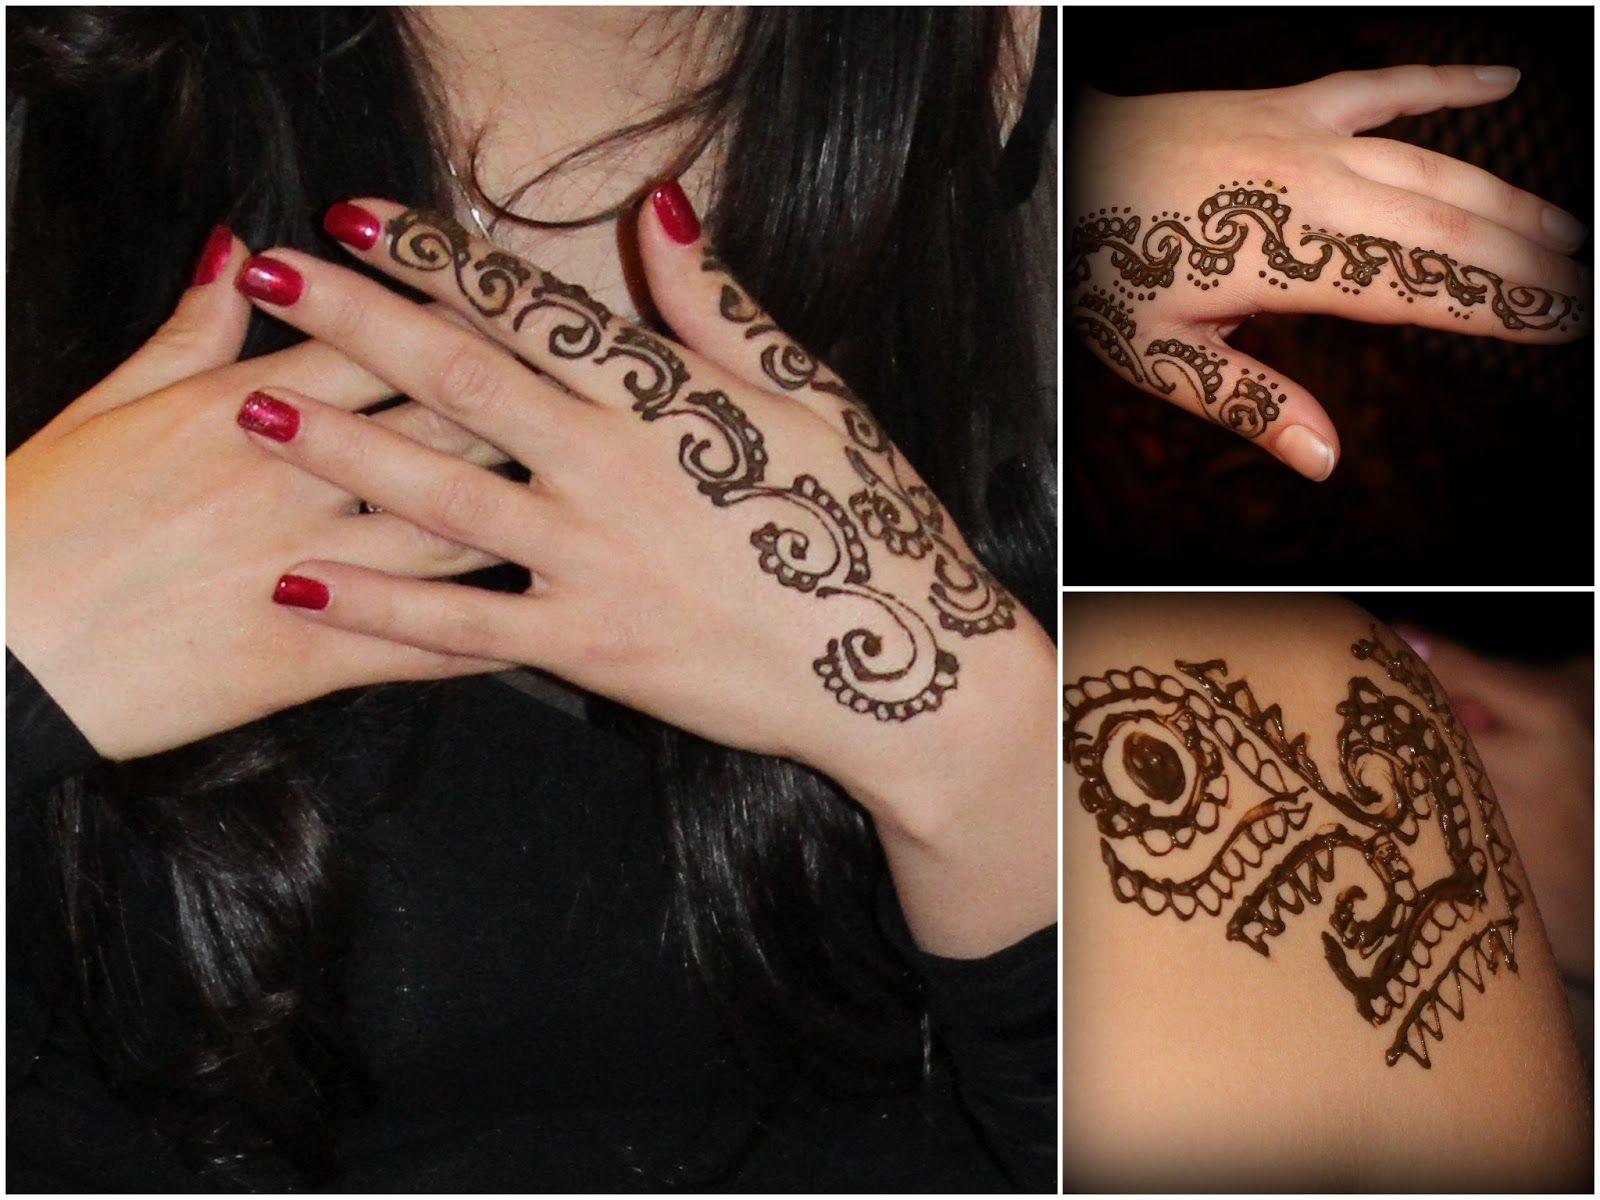 Henna Party Food : Turmeric and saffron hana bandan iranian henna bridal